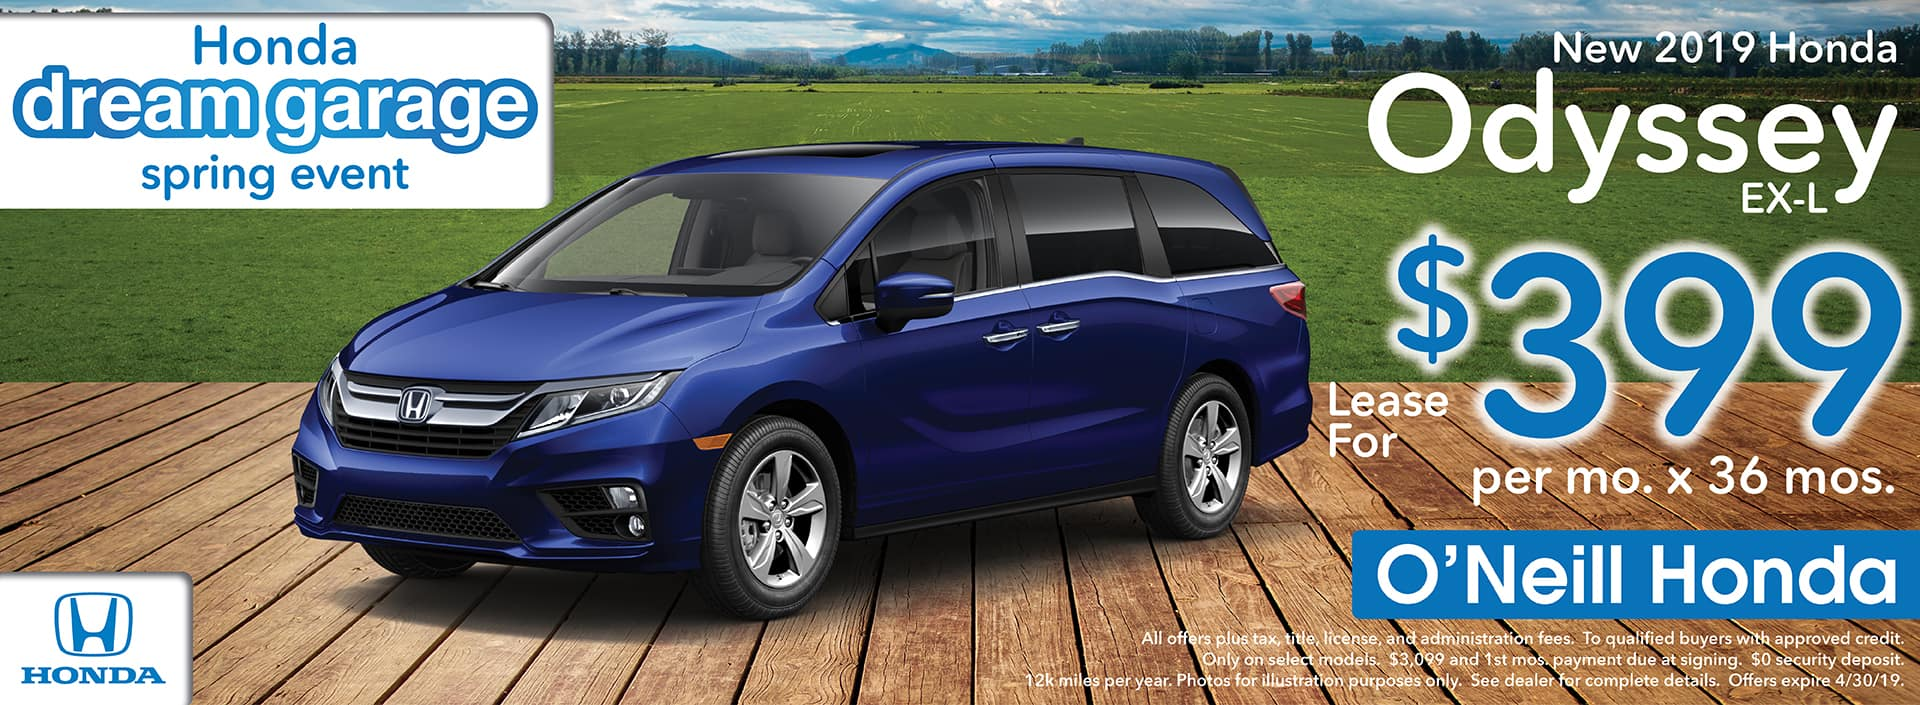 2018 Honda Odyssey Lease Offer